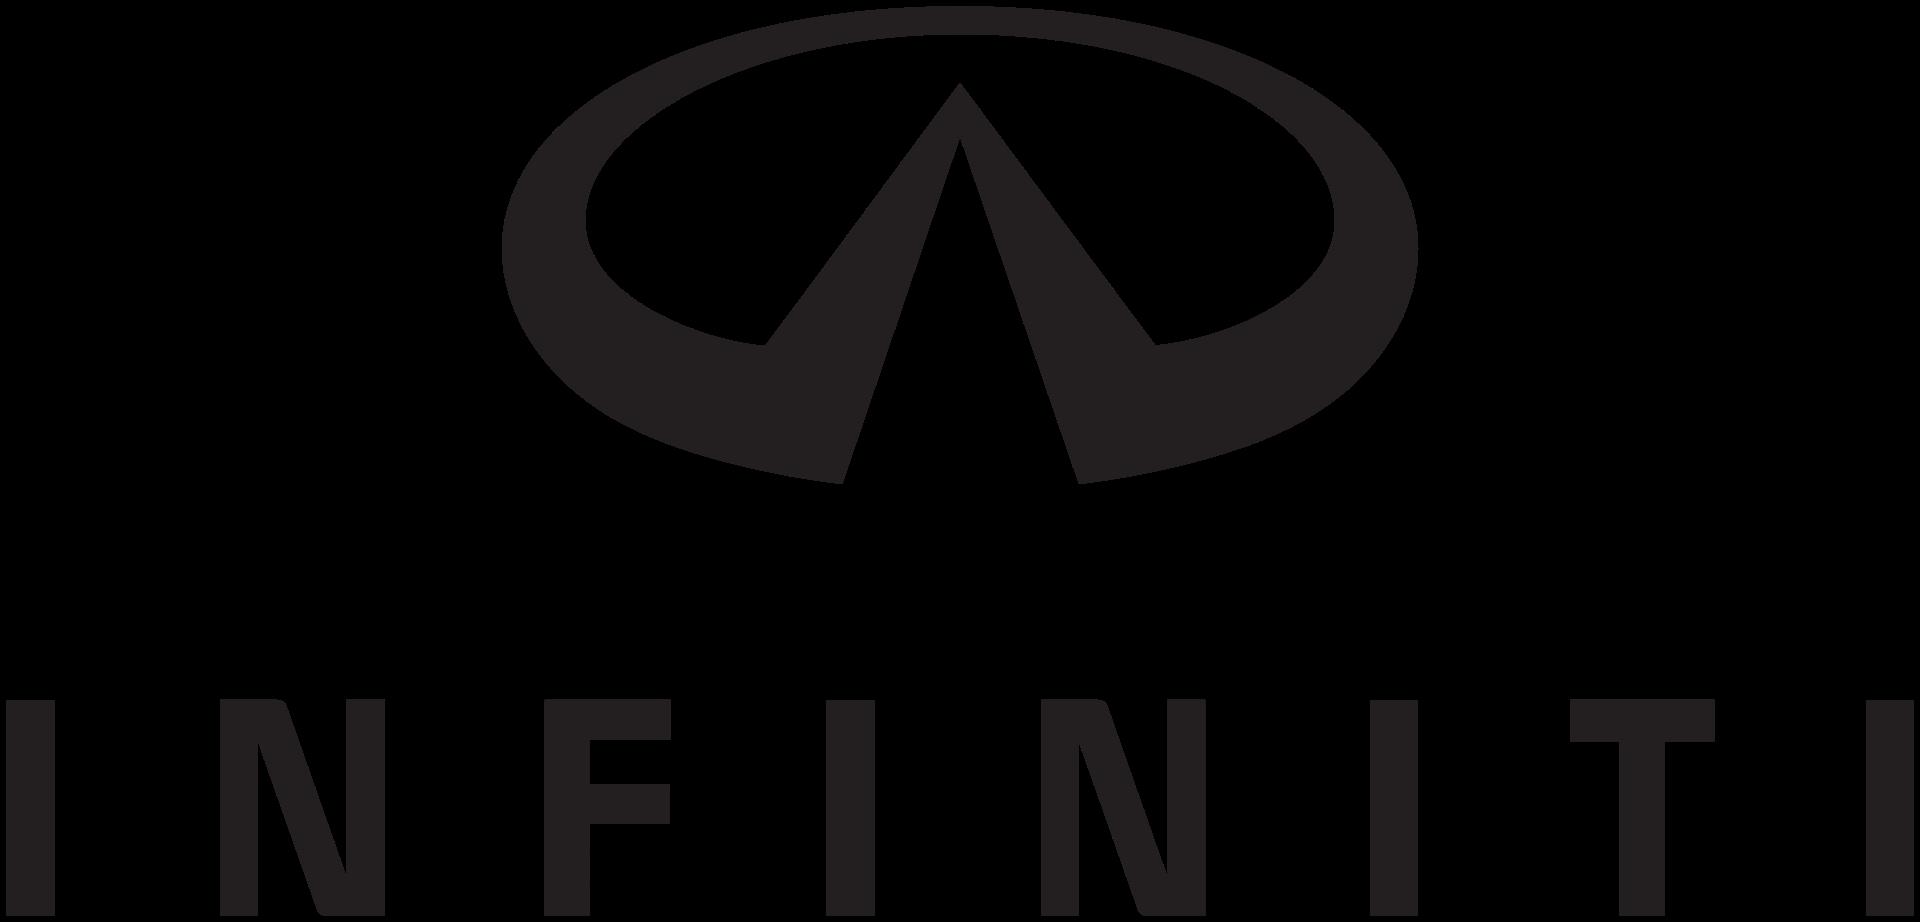 Infiniti Symbol Black 2560x1440 Hd Png Infiniti Logo Bumper Repair Car Logos